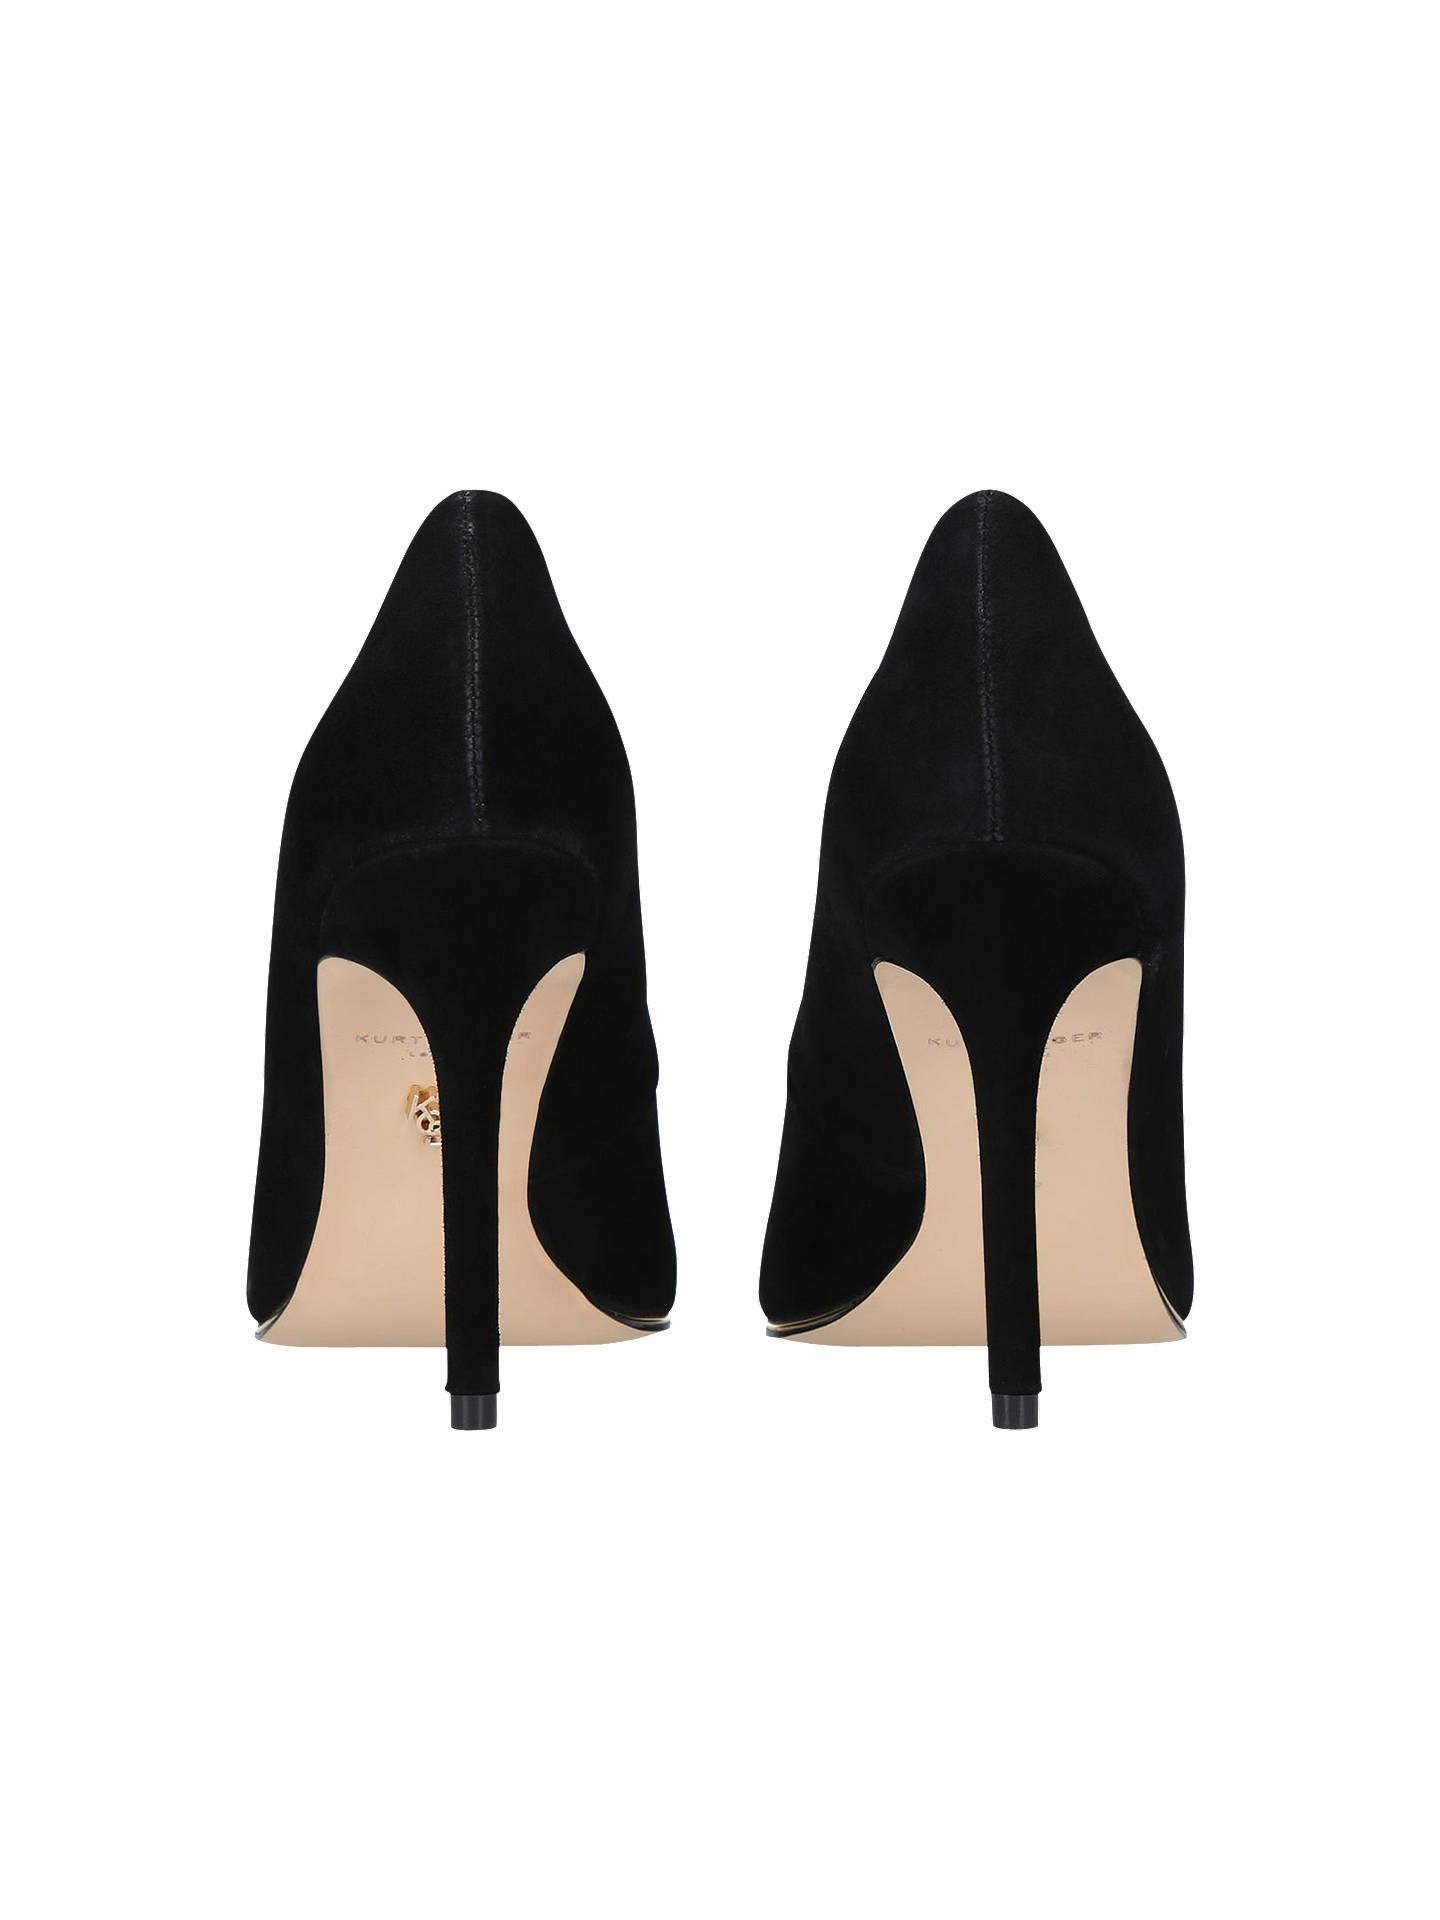 f77a1dd606 ... Buy Kurt Geiger London Audley High Heel Court Shoes, Black Suede, 3  Online at